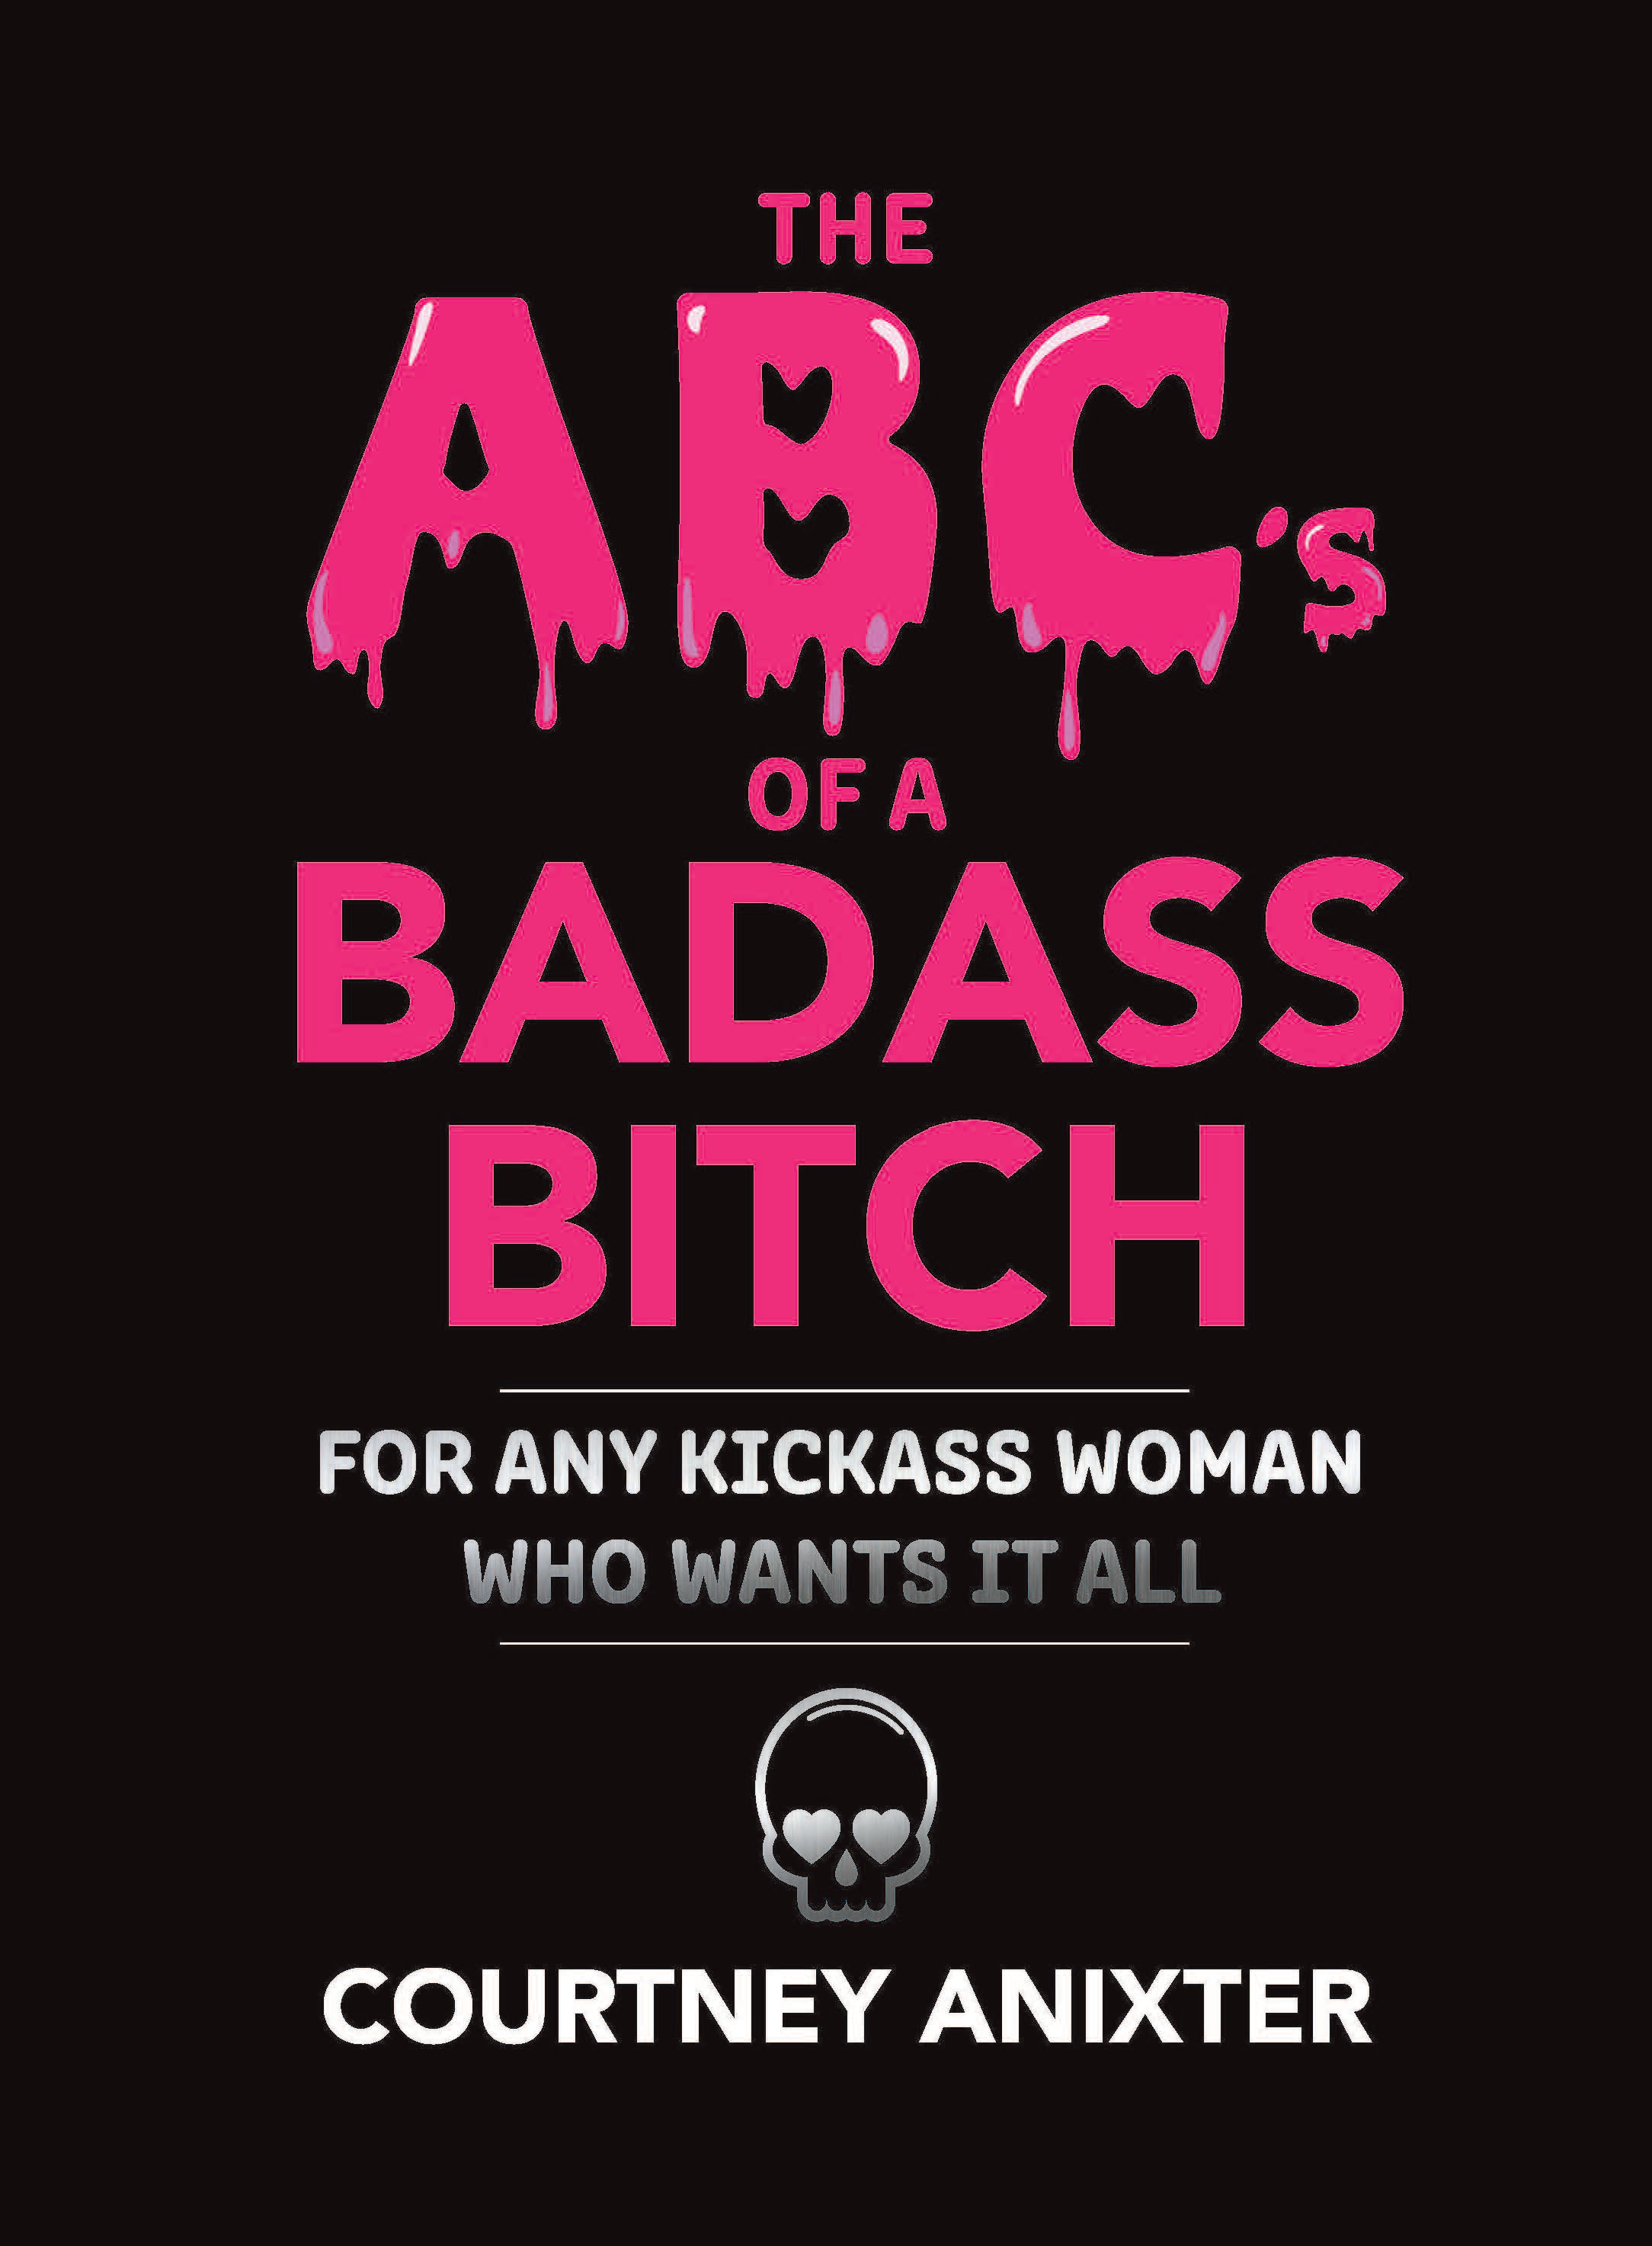 The ABC's of a Badass Bitch